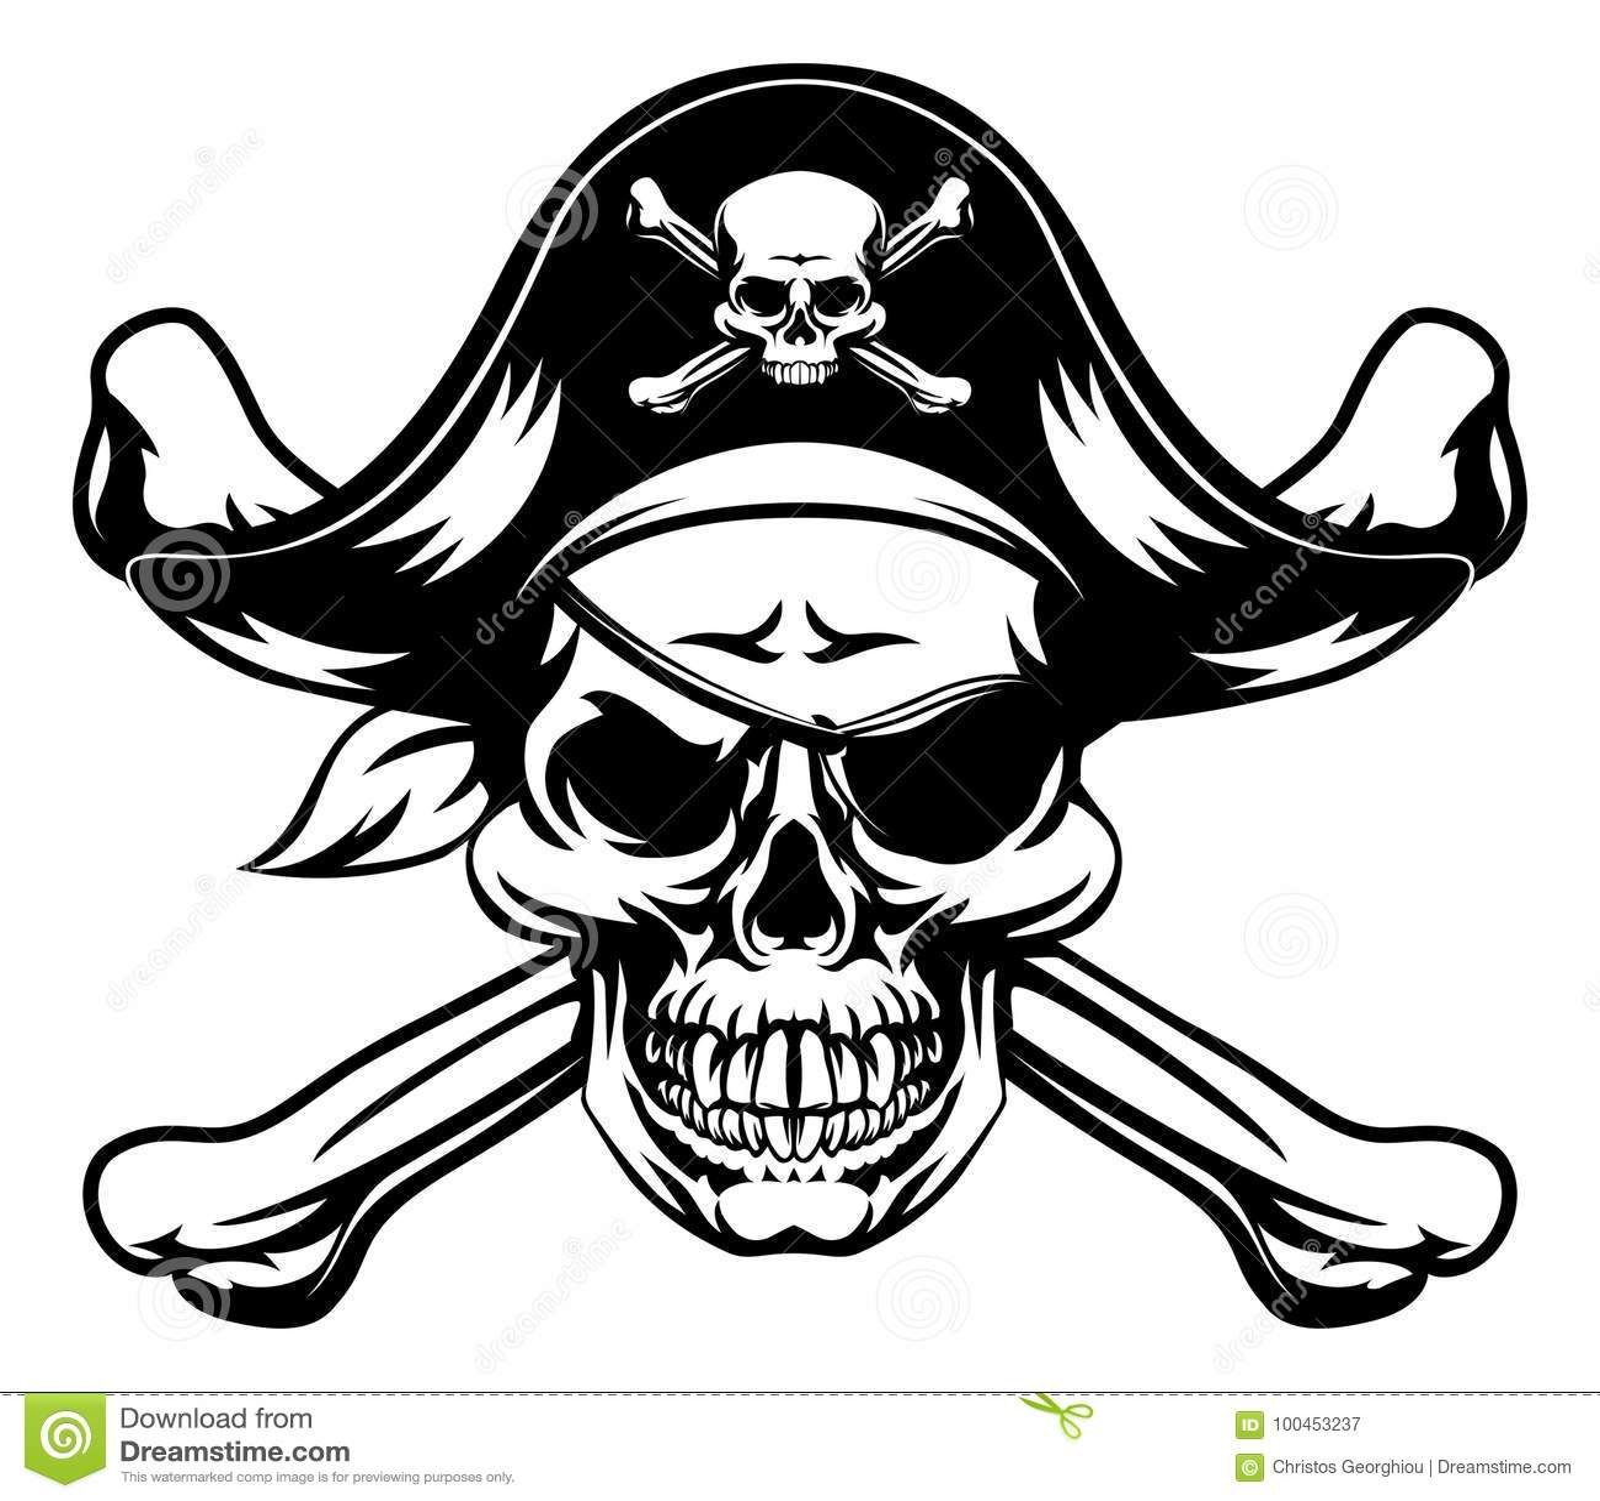 Pirate Skull And Crossbones Stock Vector